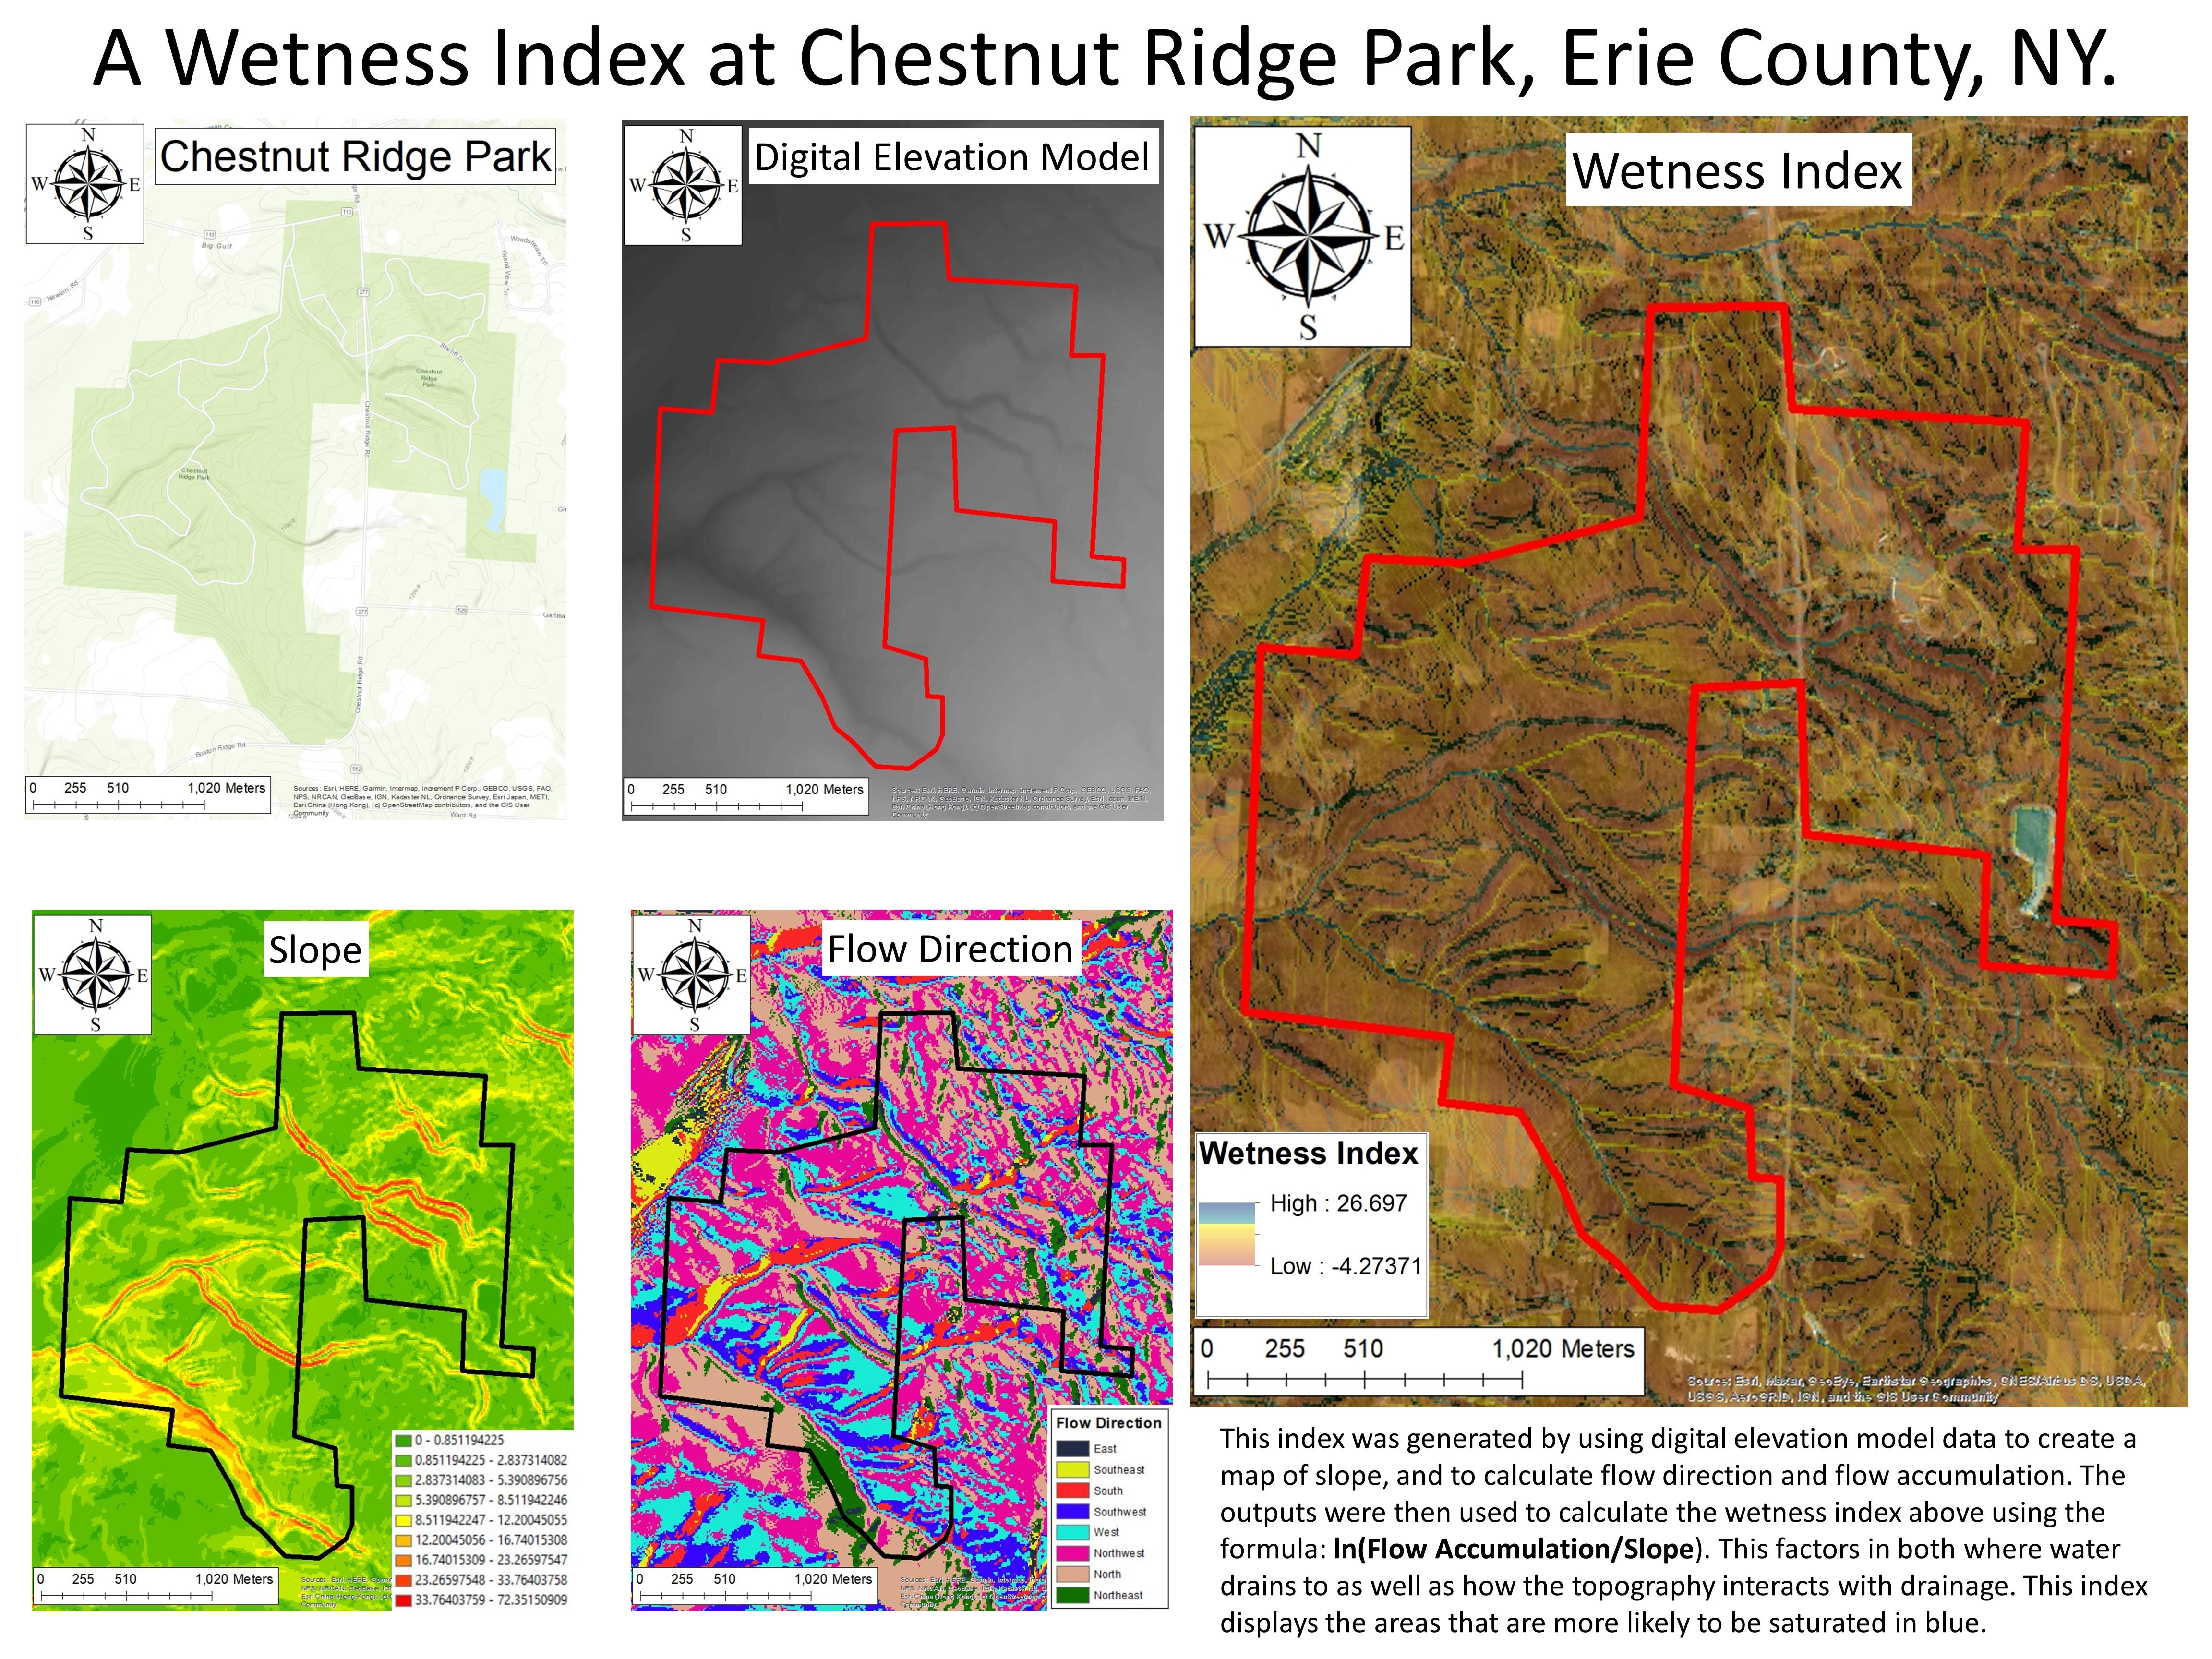 3 maps showing chestnut ridge park boundaries and wetness area